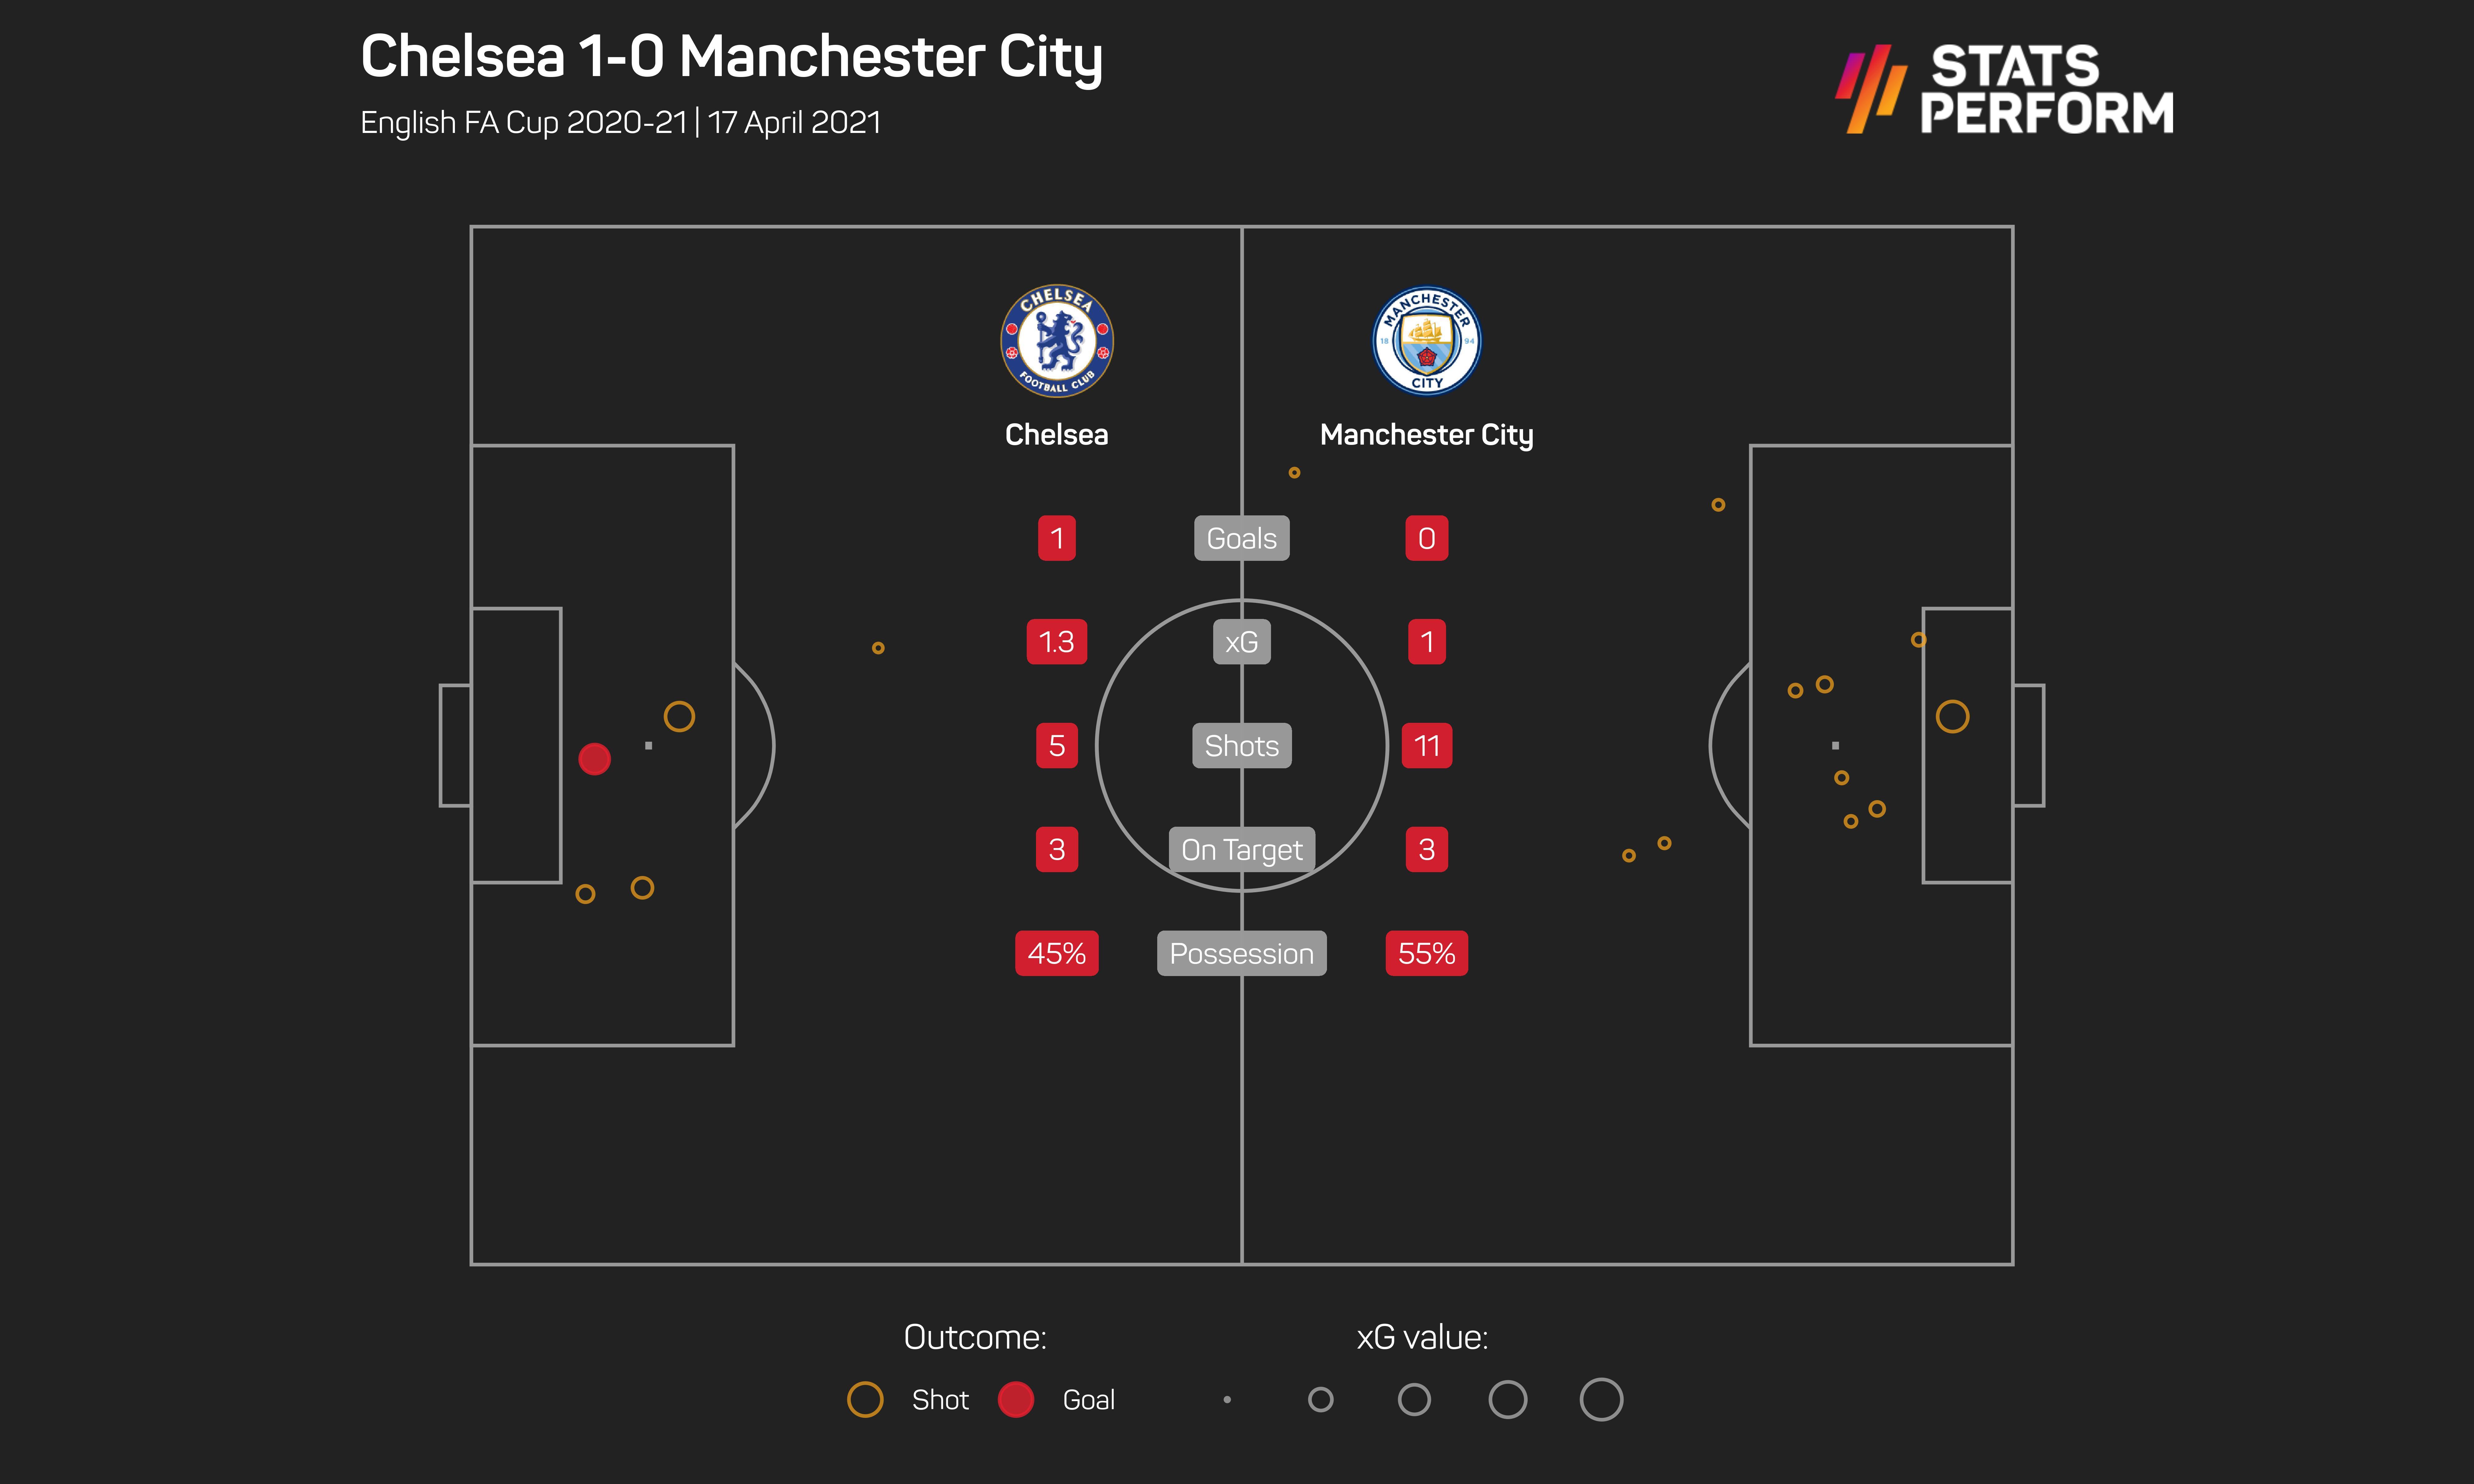 Chelsea 1-0 Man City